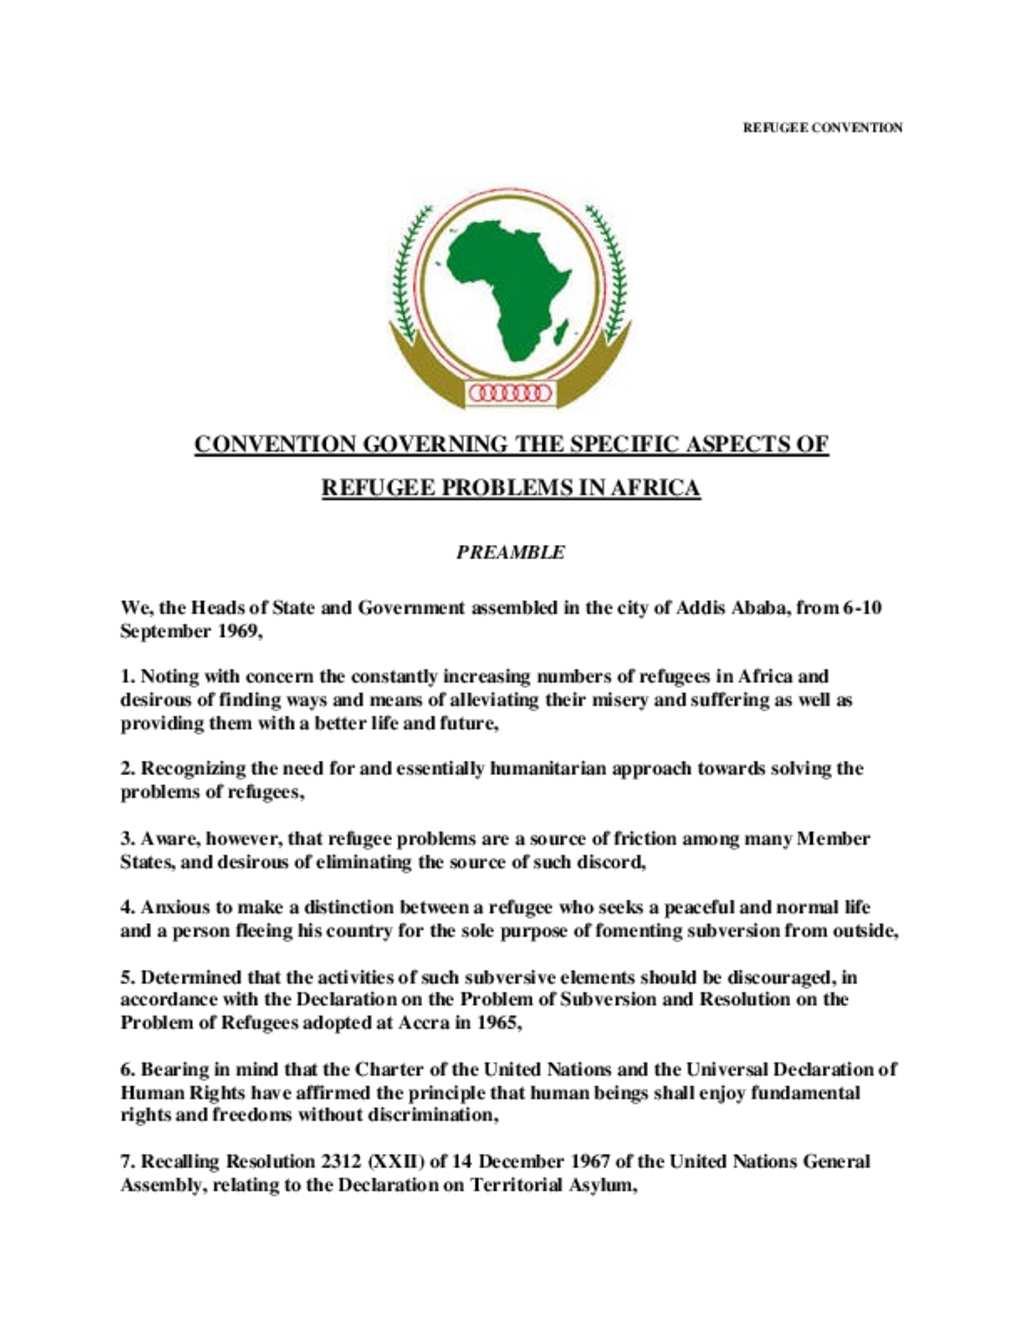 Document - OAU Refugee Convention